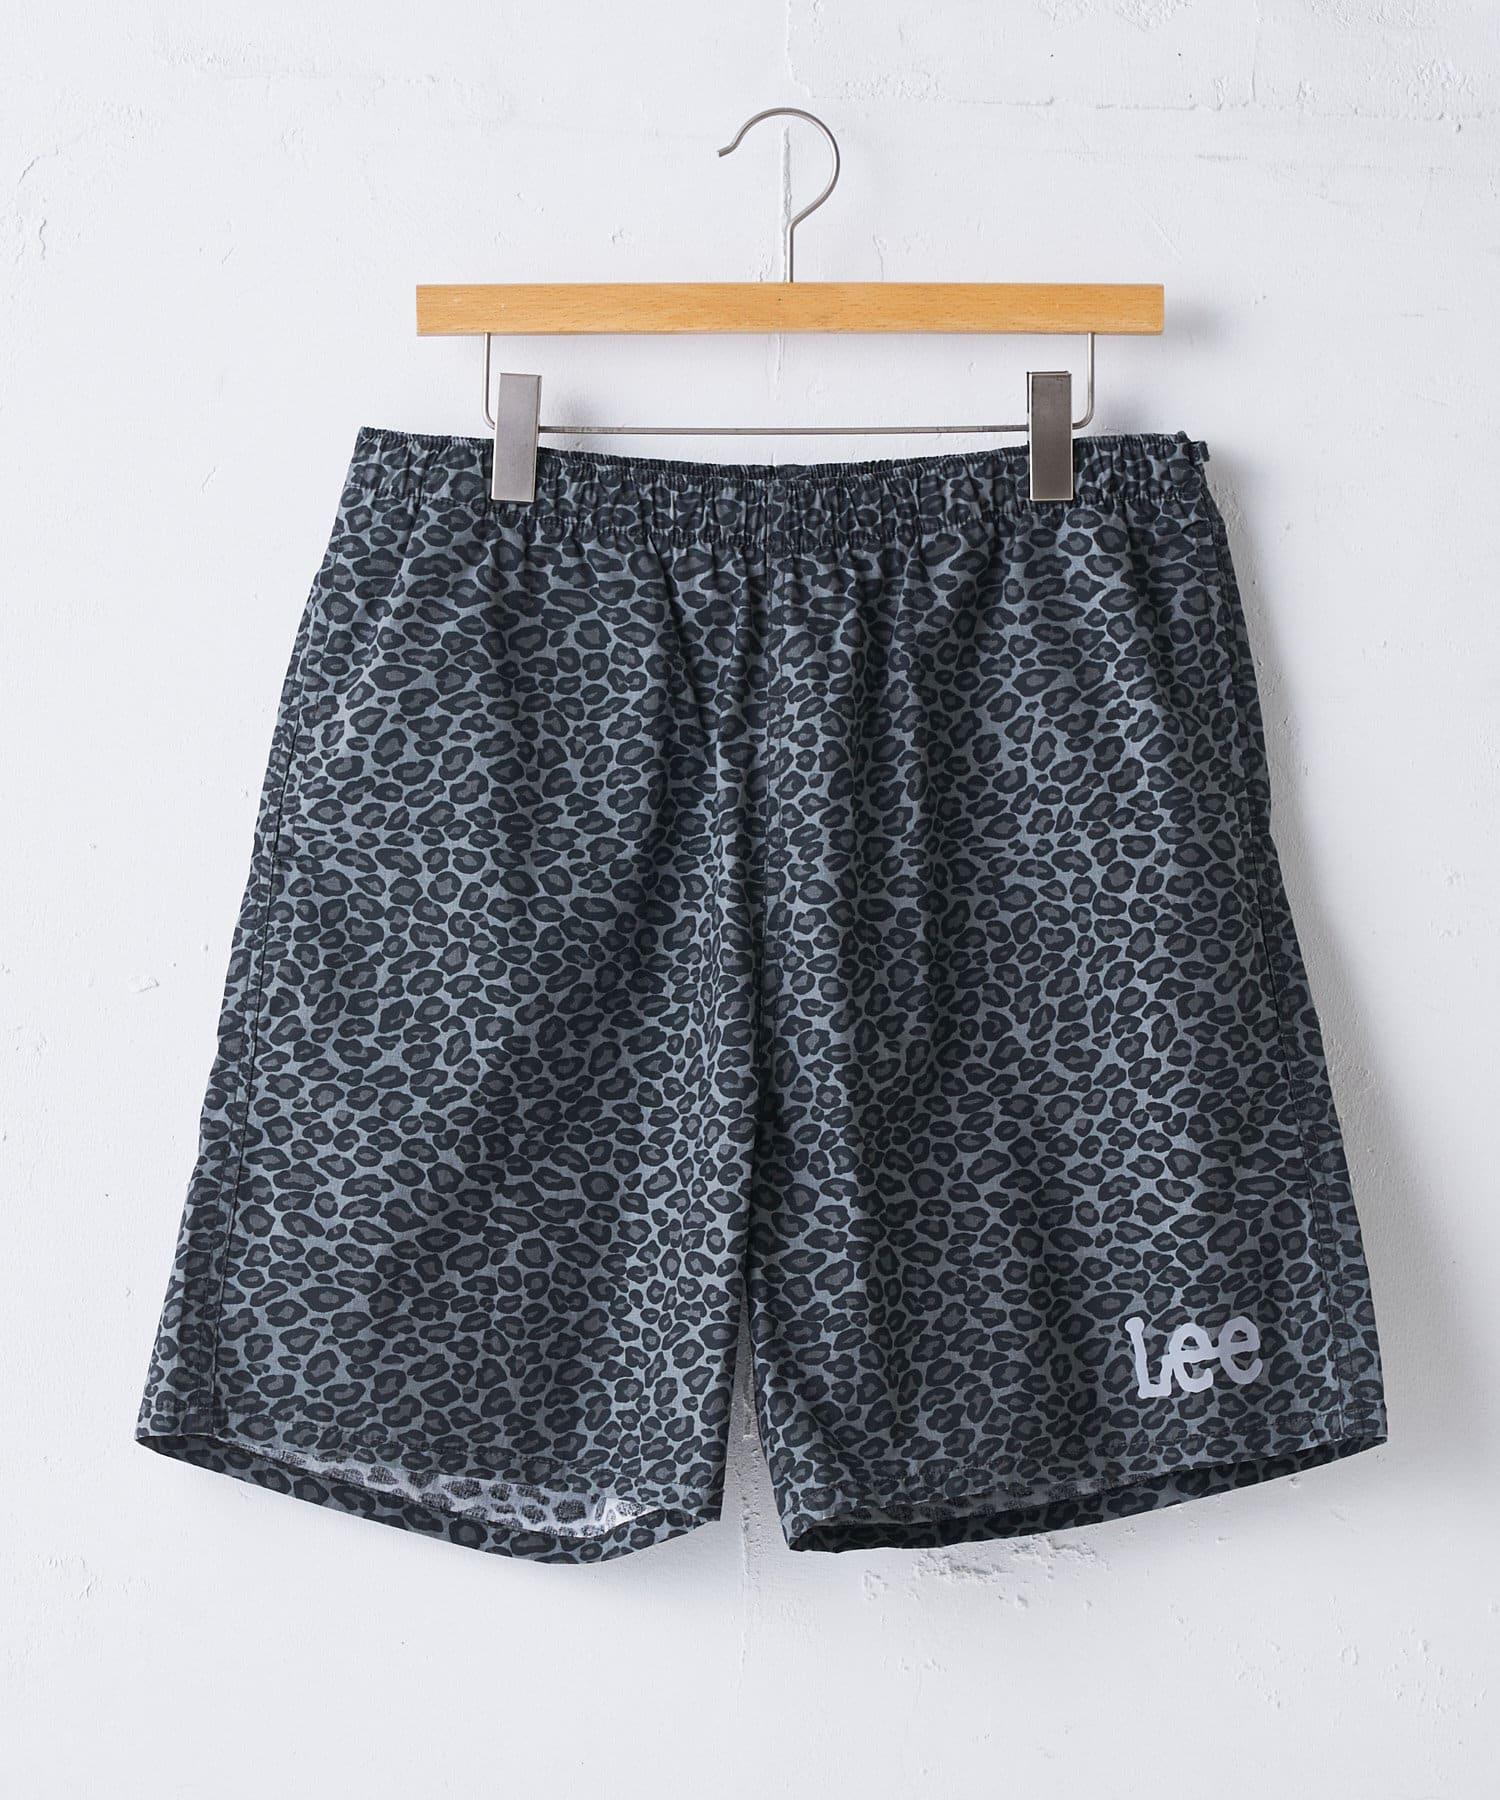 Discoat(ディスコート) 【Lee/リー】オーセンティックショーツ